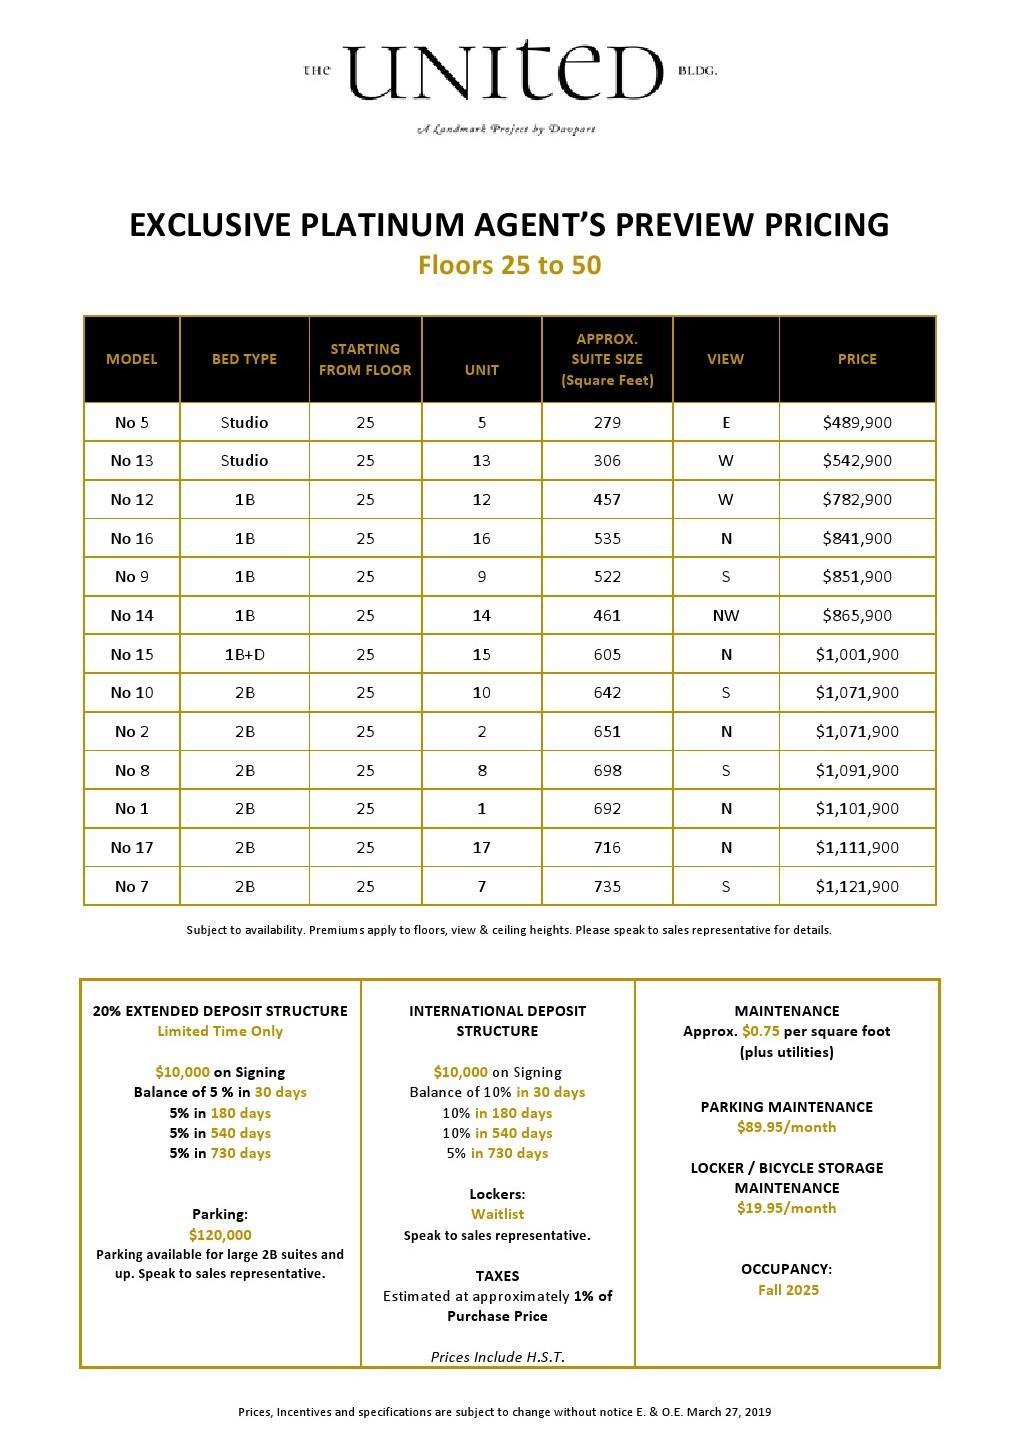 The United Bldg. Condos Price List